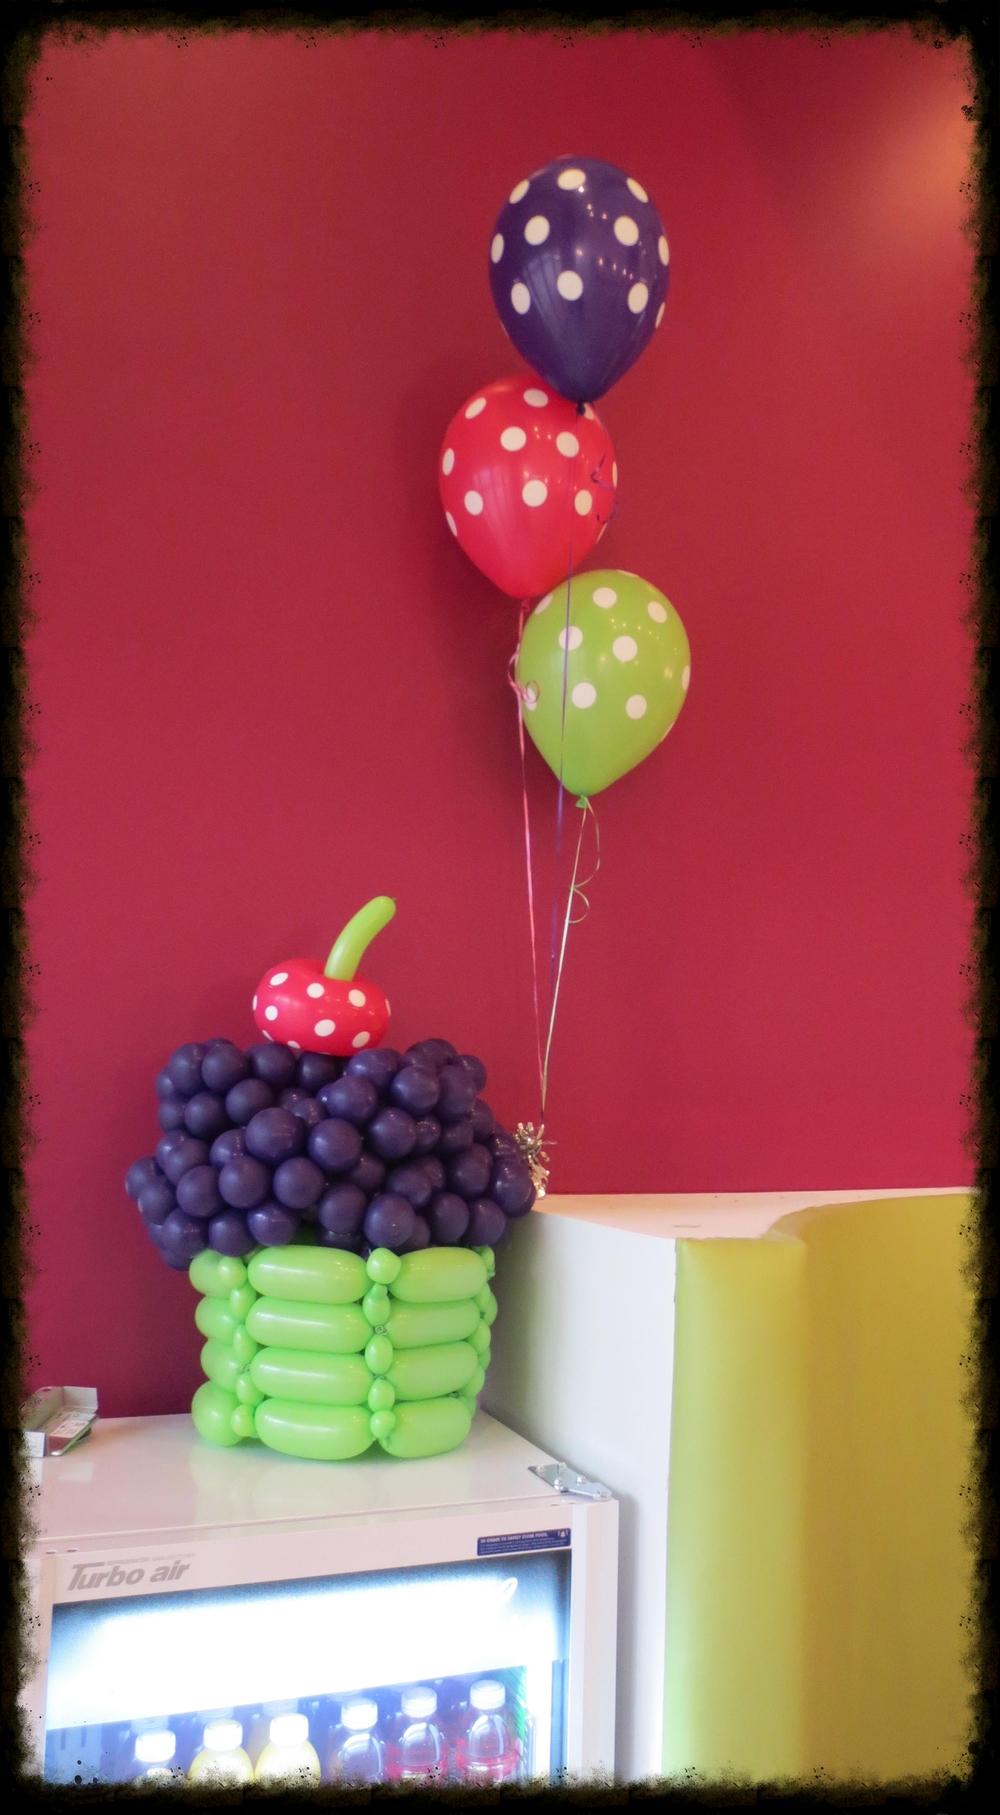 yogurtcupcake2_zps334fc1ef.jpg